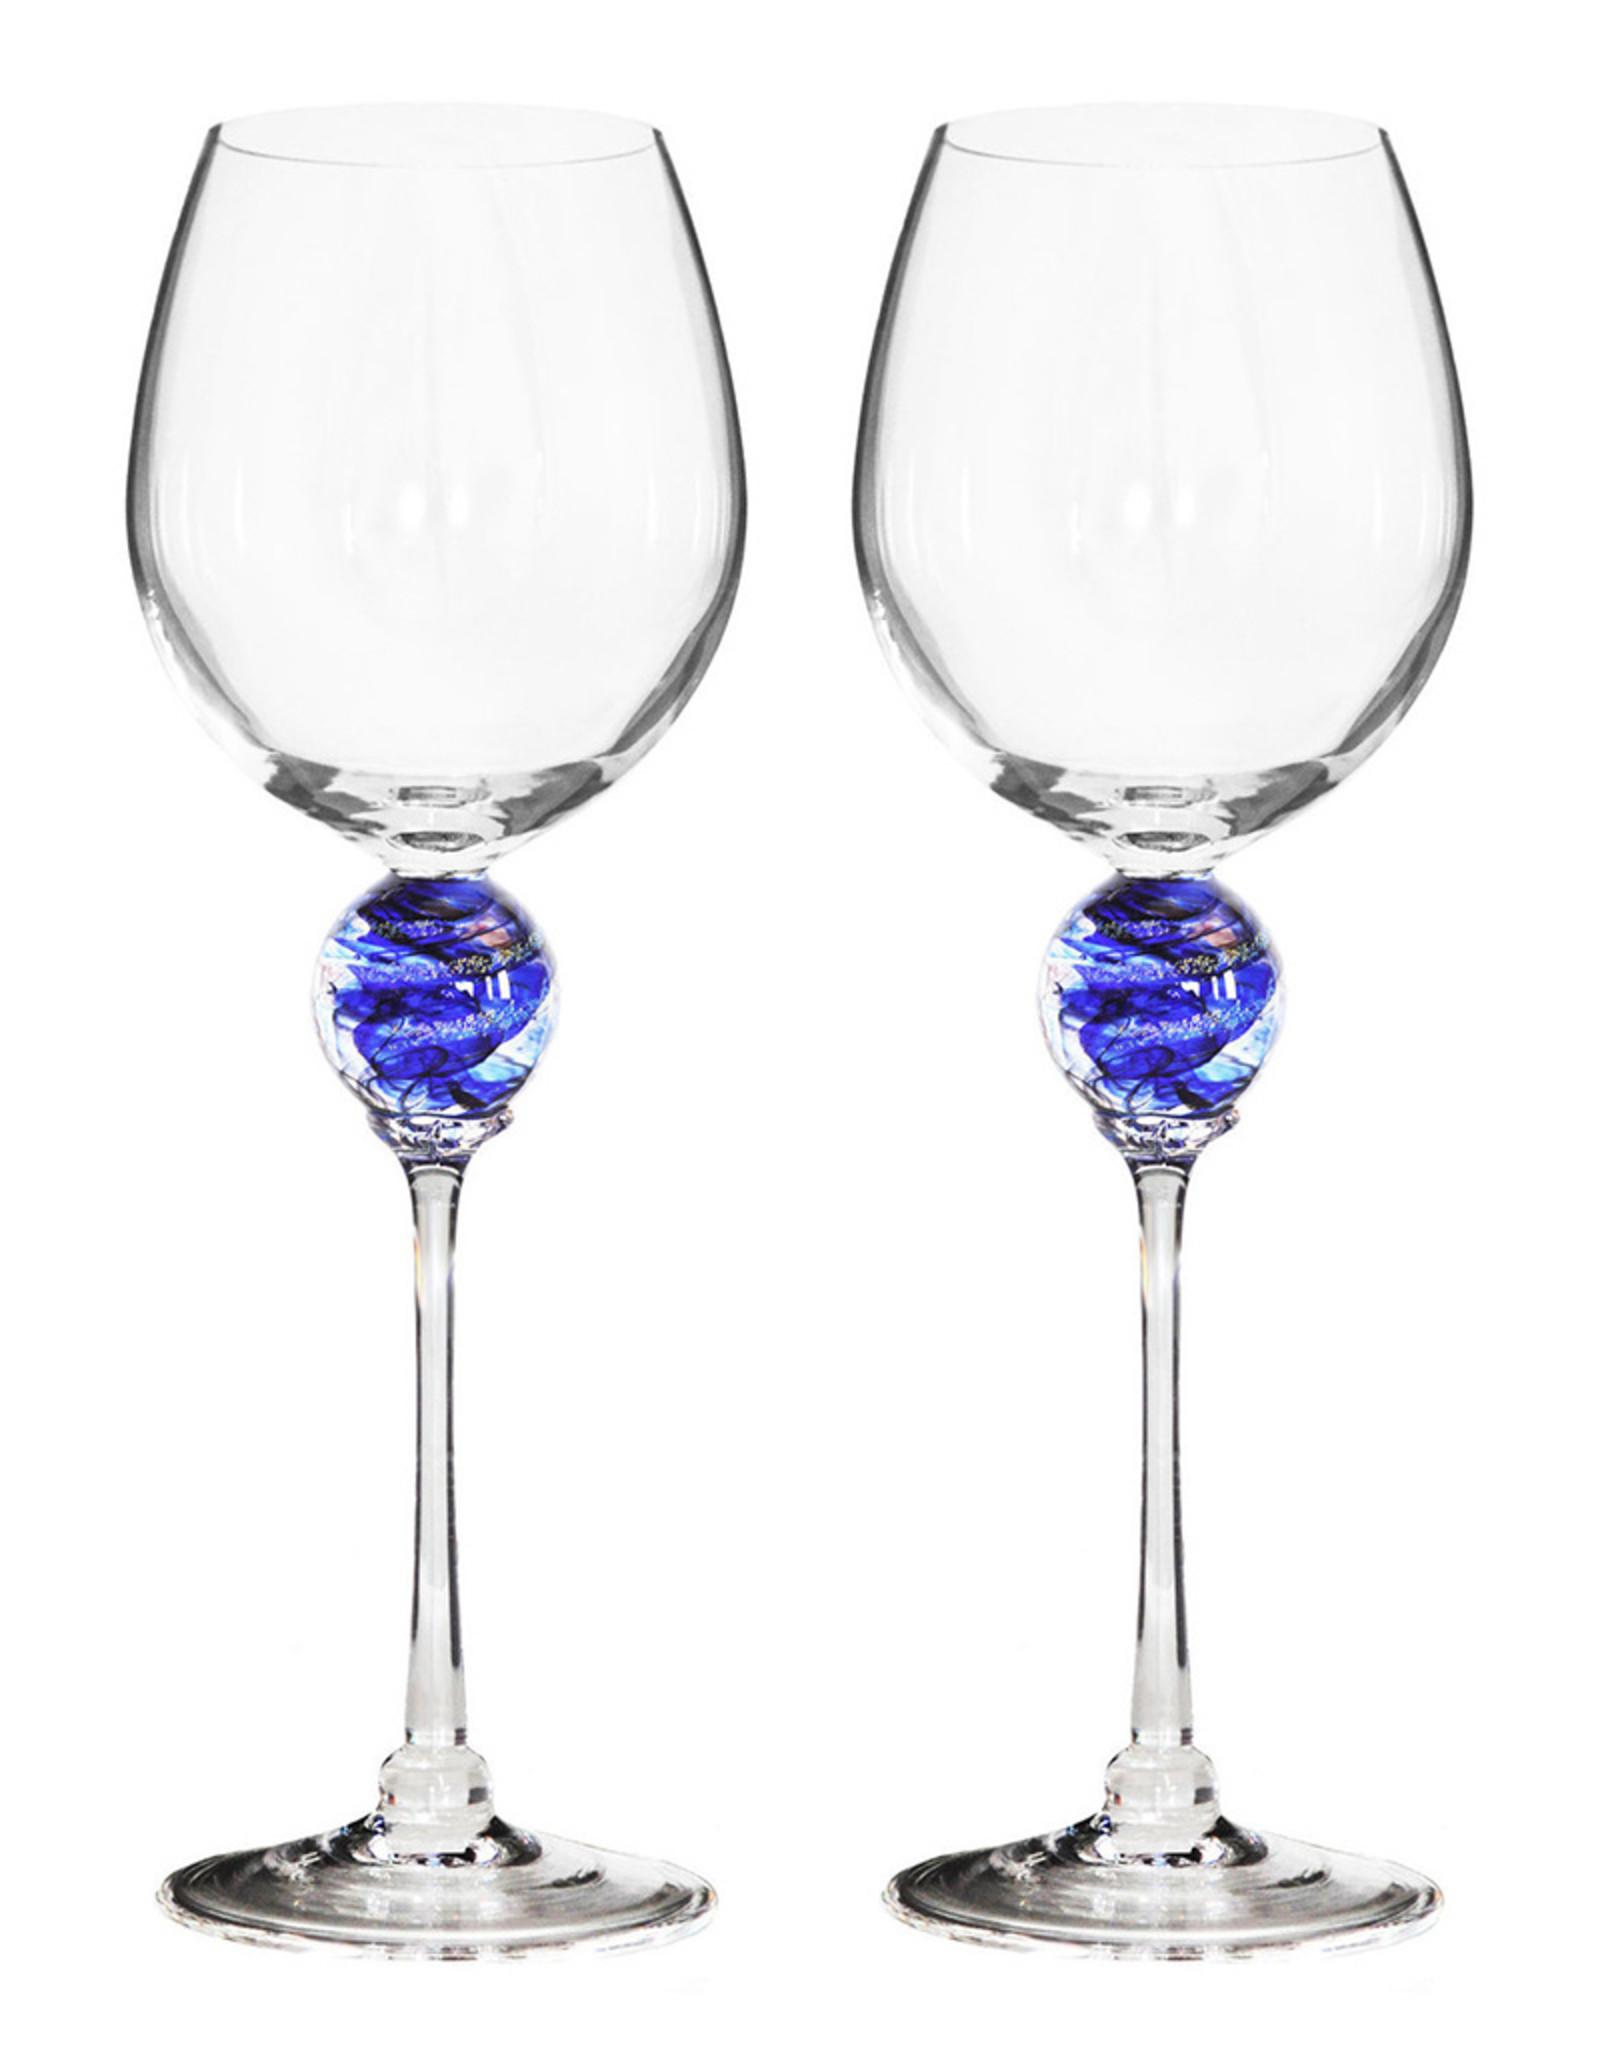 ROMEO GLASS COBALT PLANET WINE GLASS